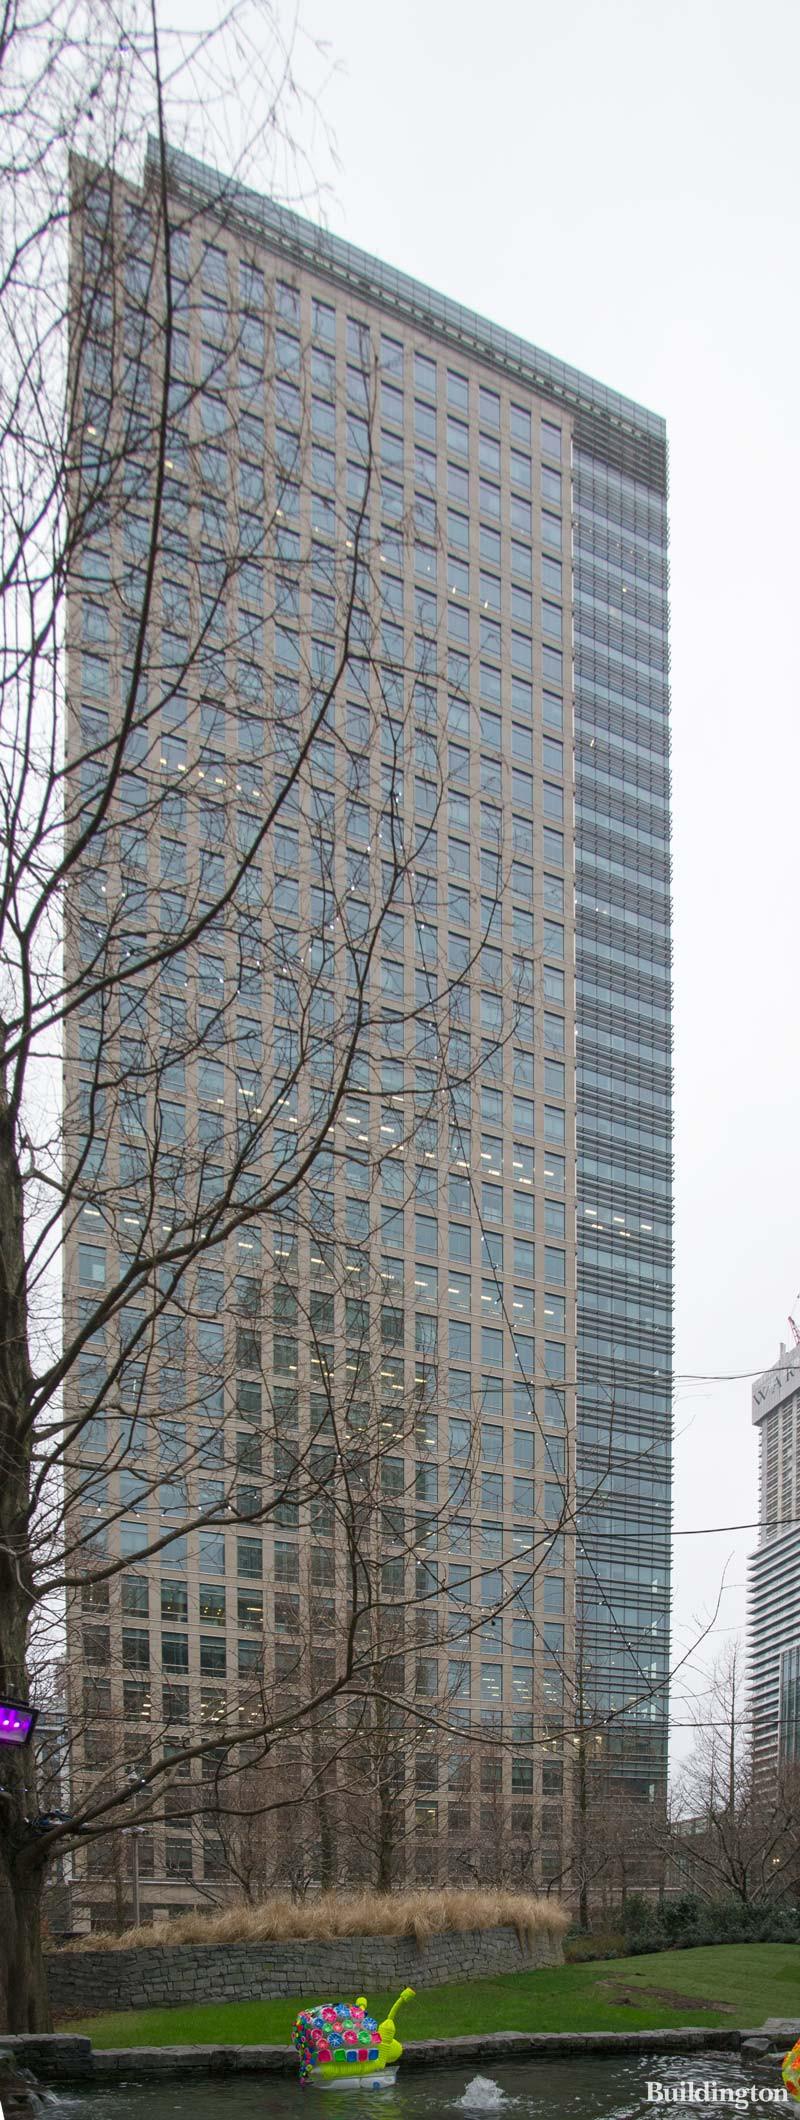 40 Bank Street - Bank Street E14 5AB | Buildington